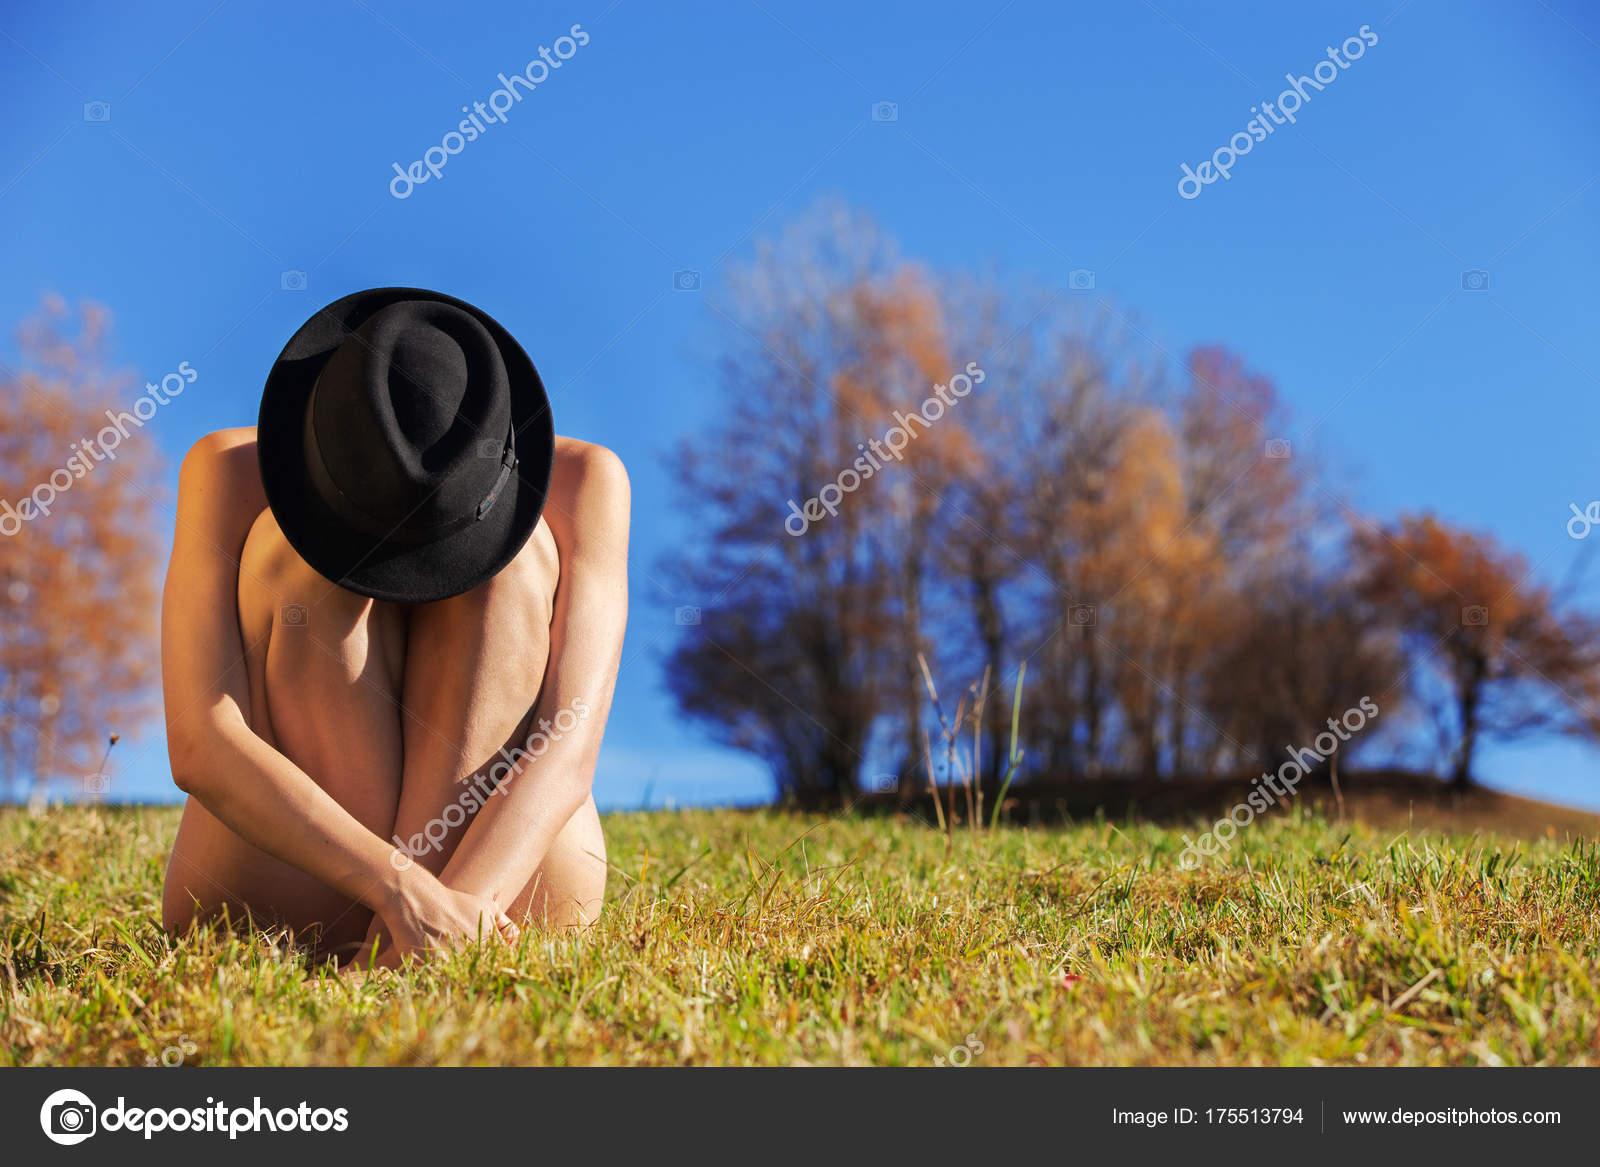 les jeunes nues filles en herbe